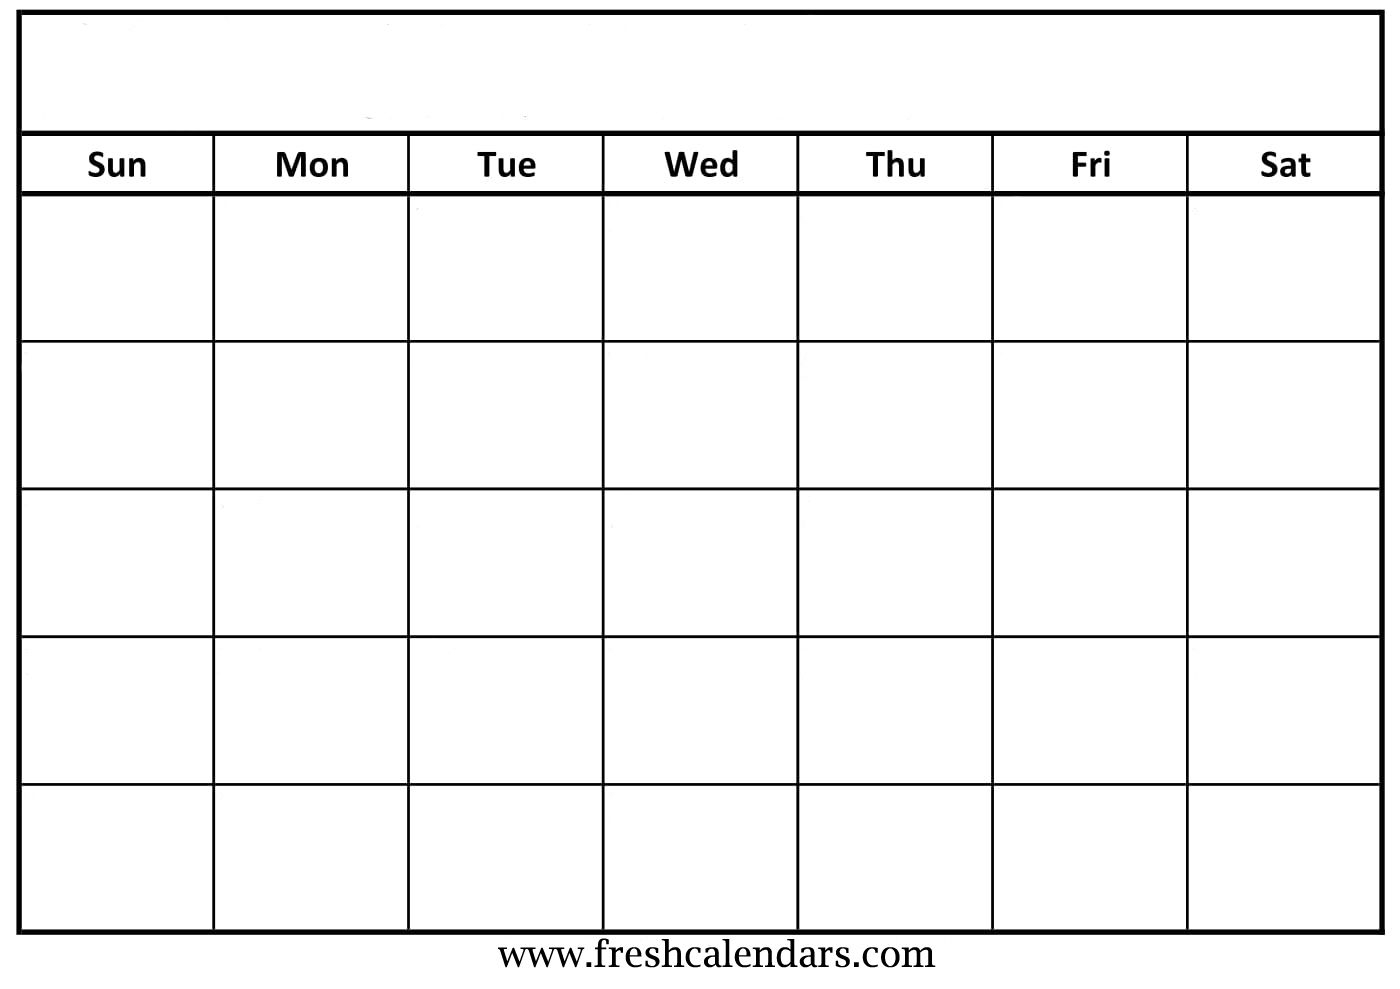 Blank Calendar: Wonderfully Printable 2019 Templates within Blank Calendar To Fill In